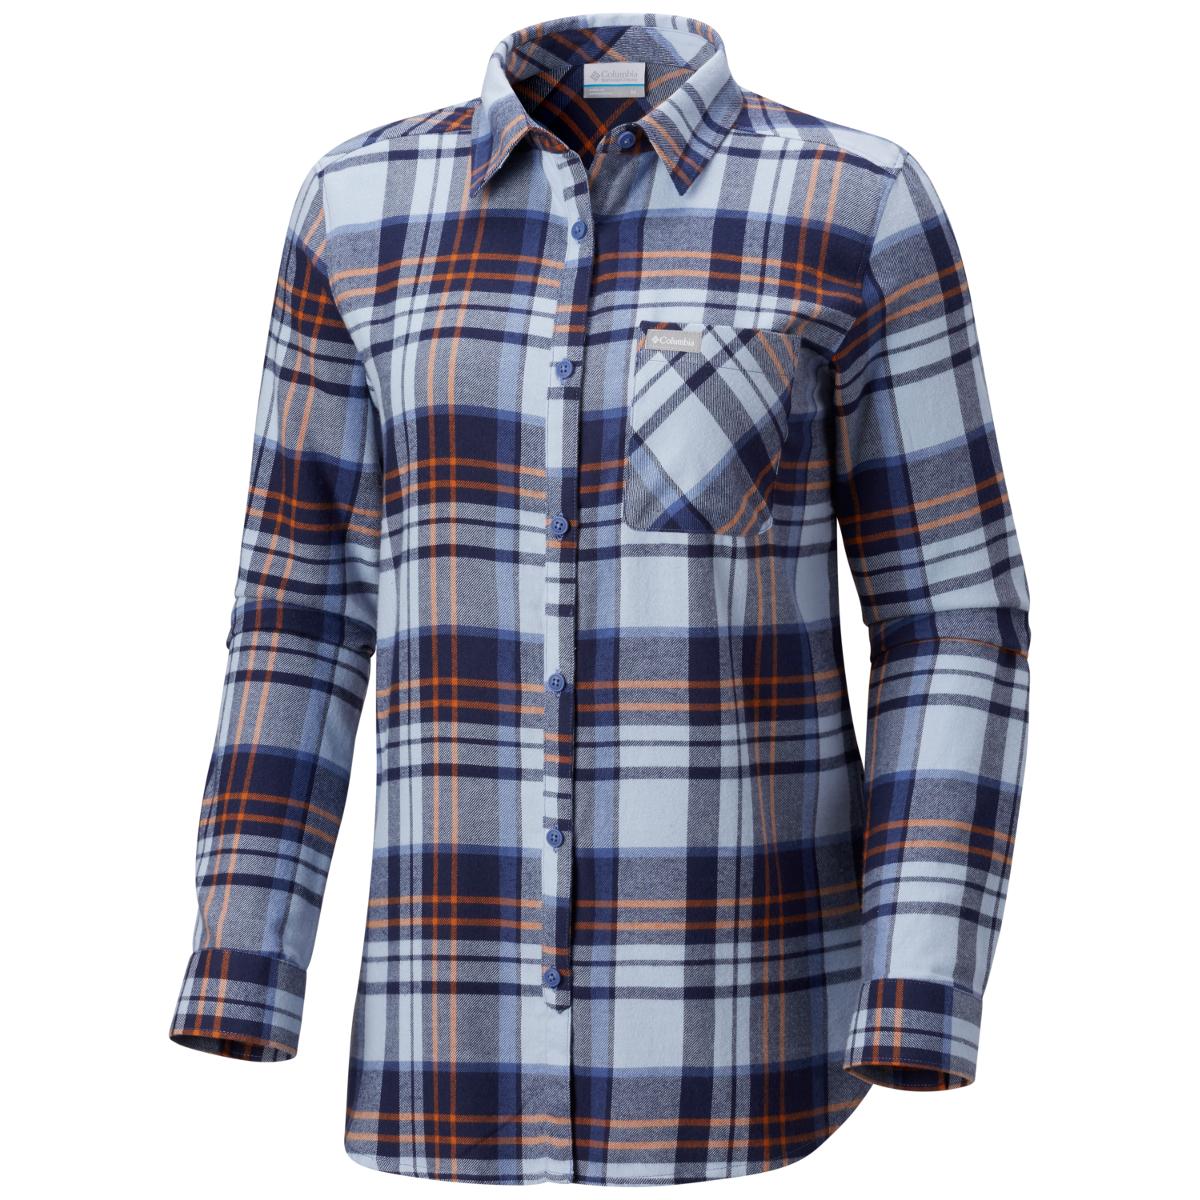 Columbia Women's Simply Put Ii Long-Sleeve Flannel Shirt - Blue, XL